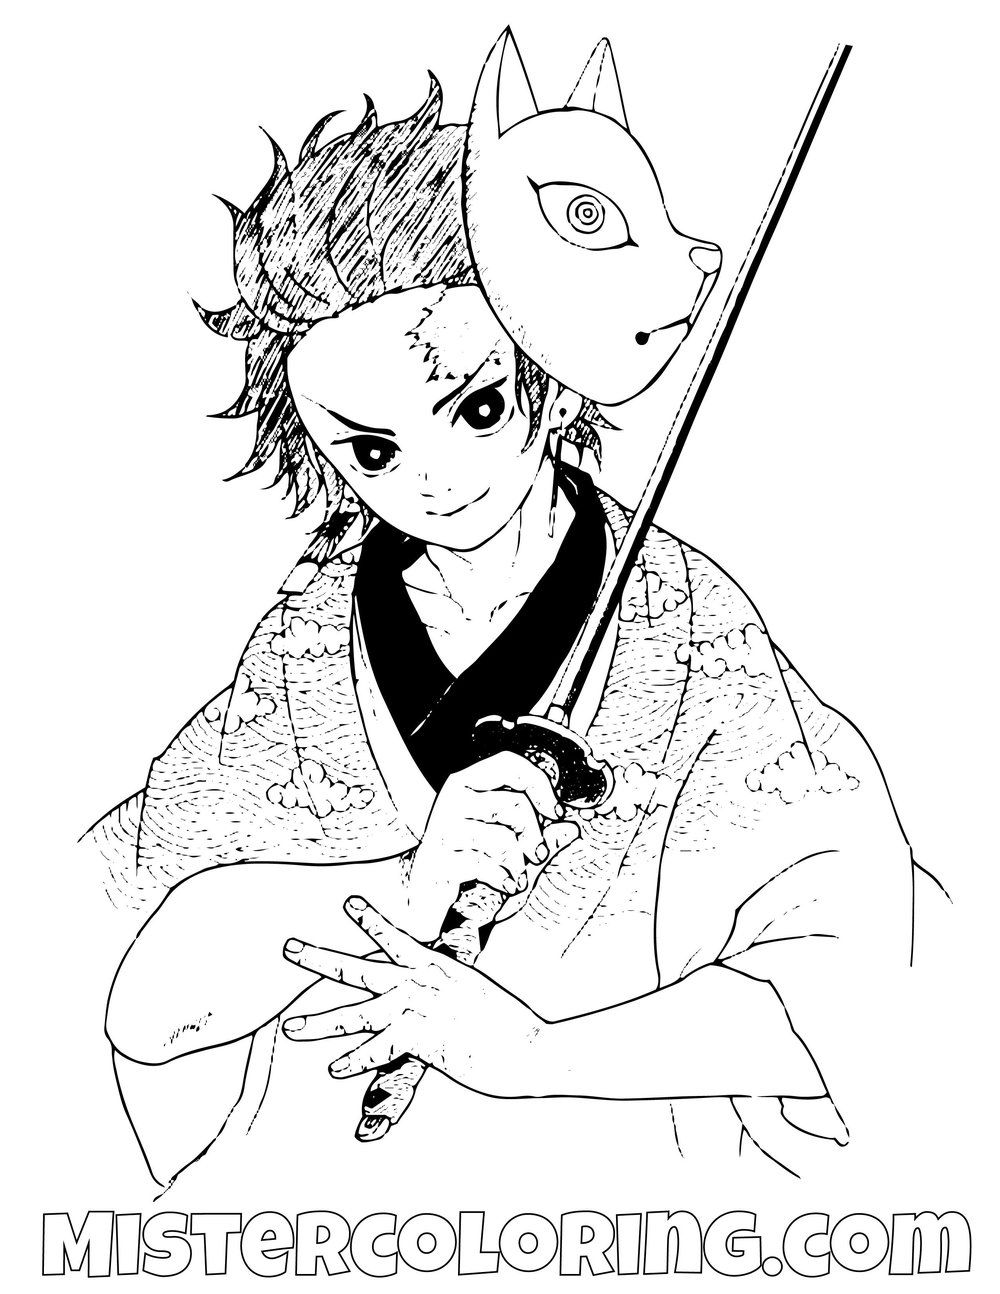 27+ Demon slayer coloring pages inosuke info